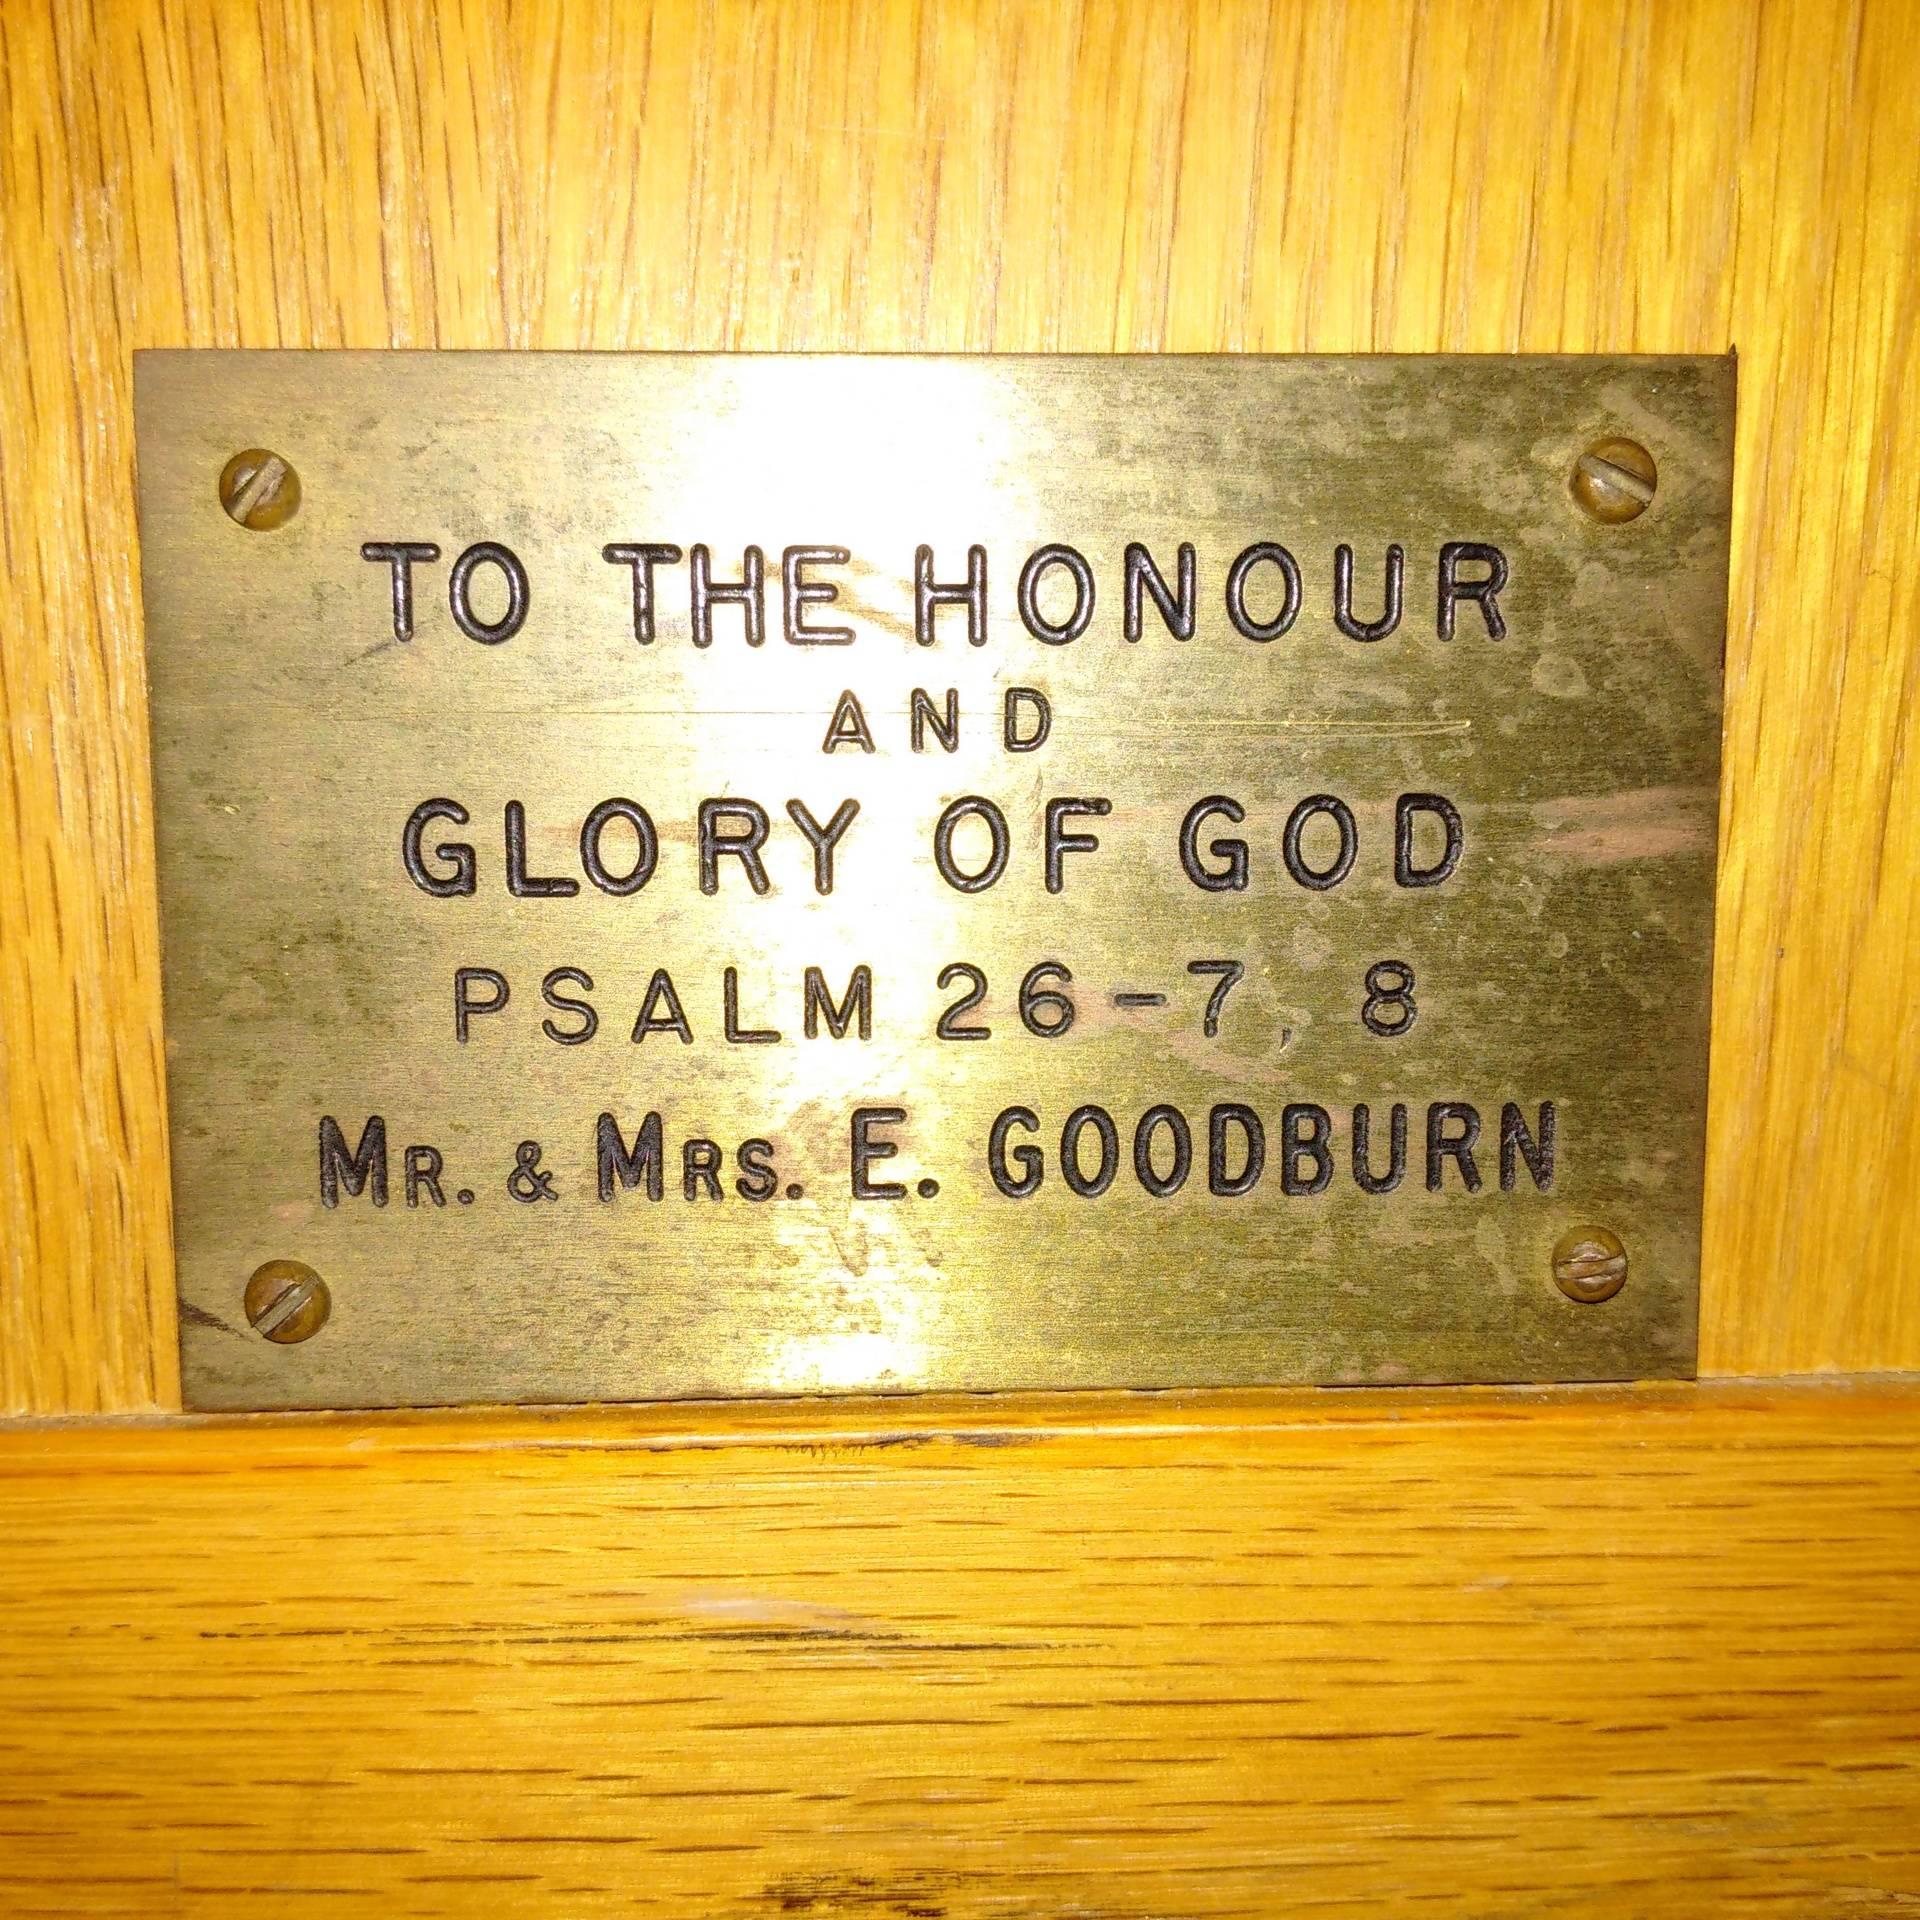 Mr. & Mrs. E. Goodburn